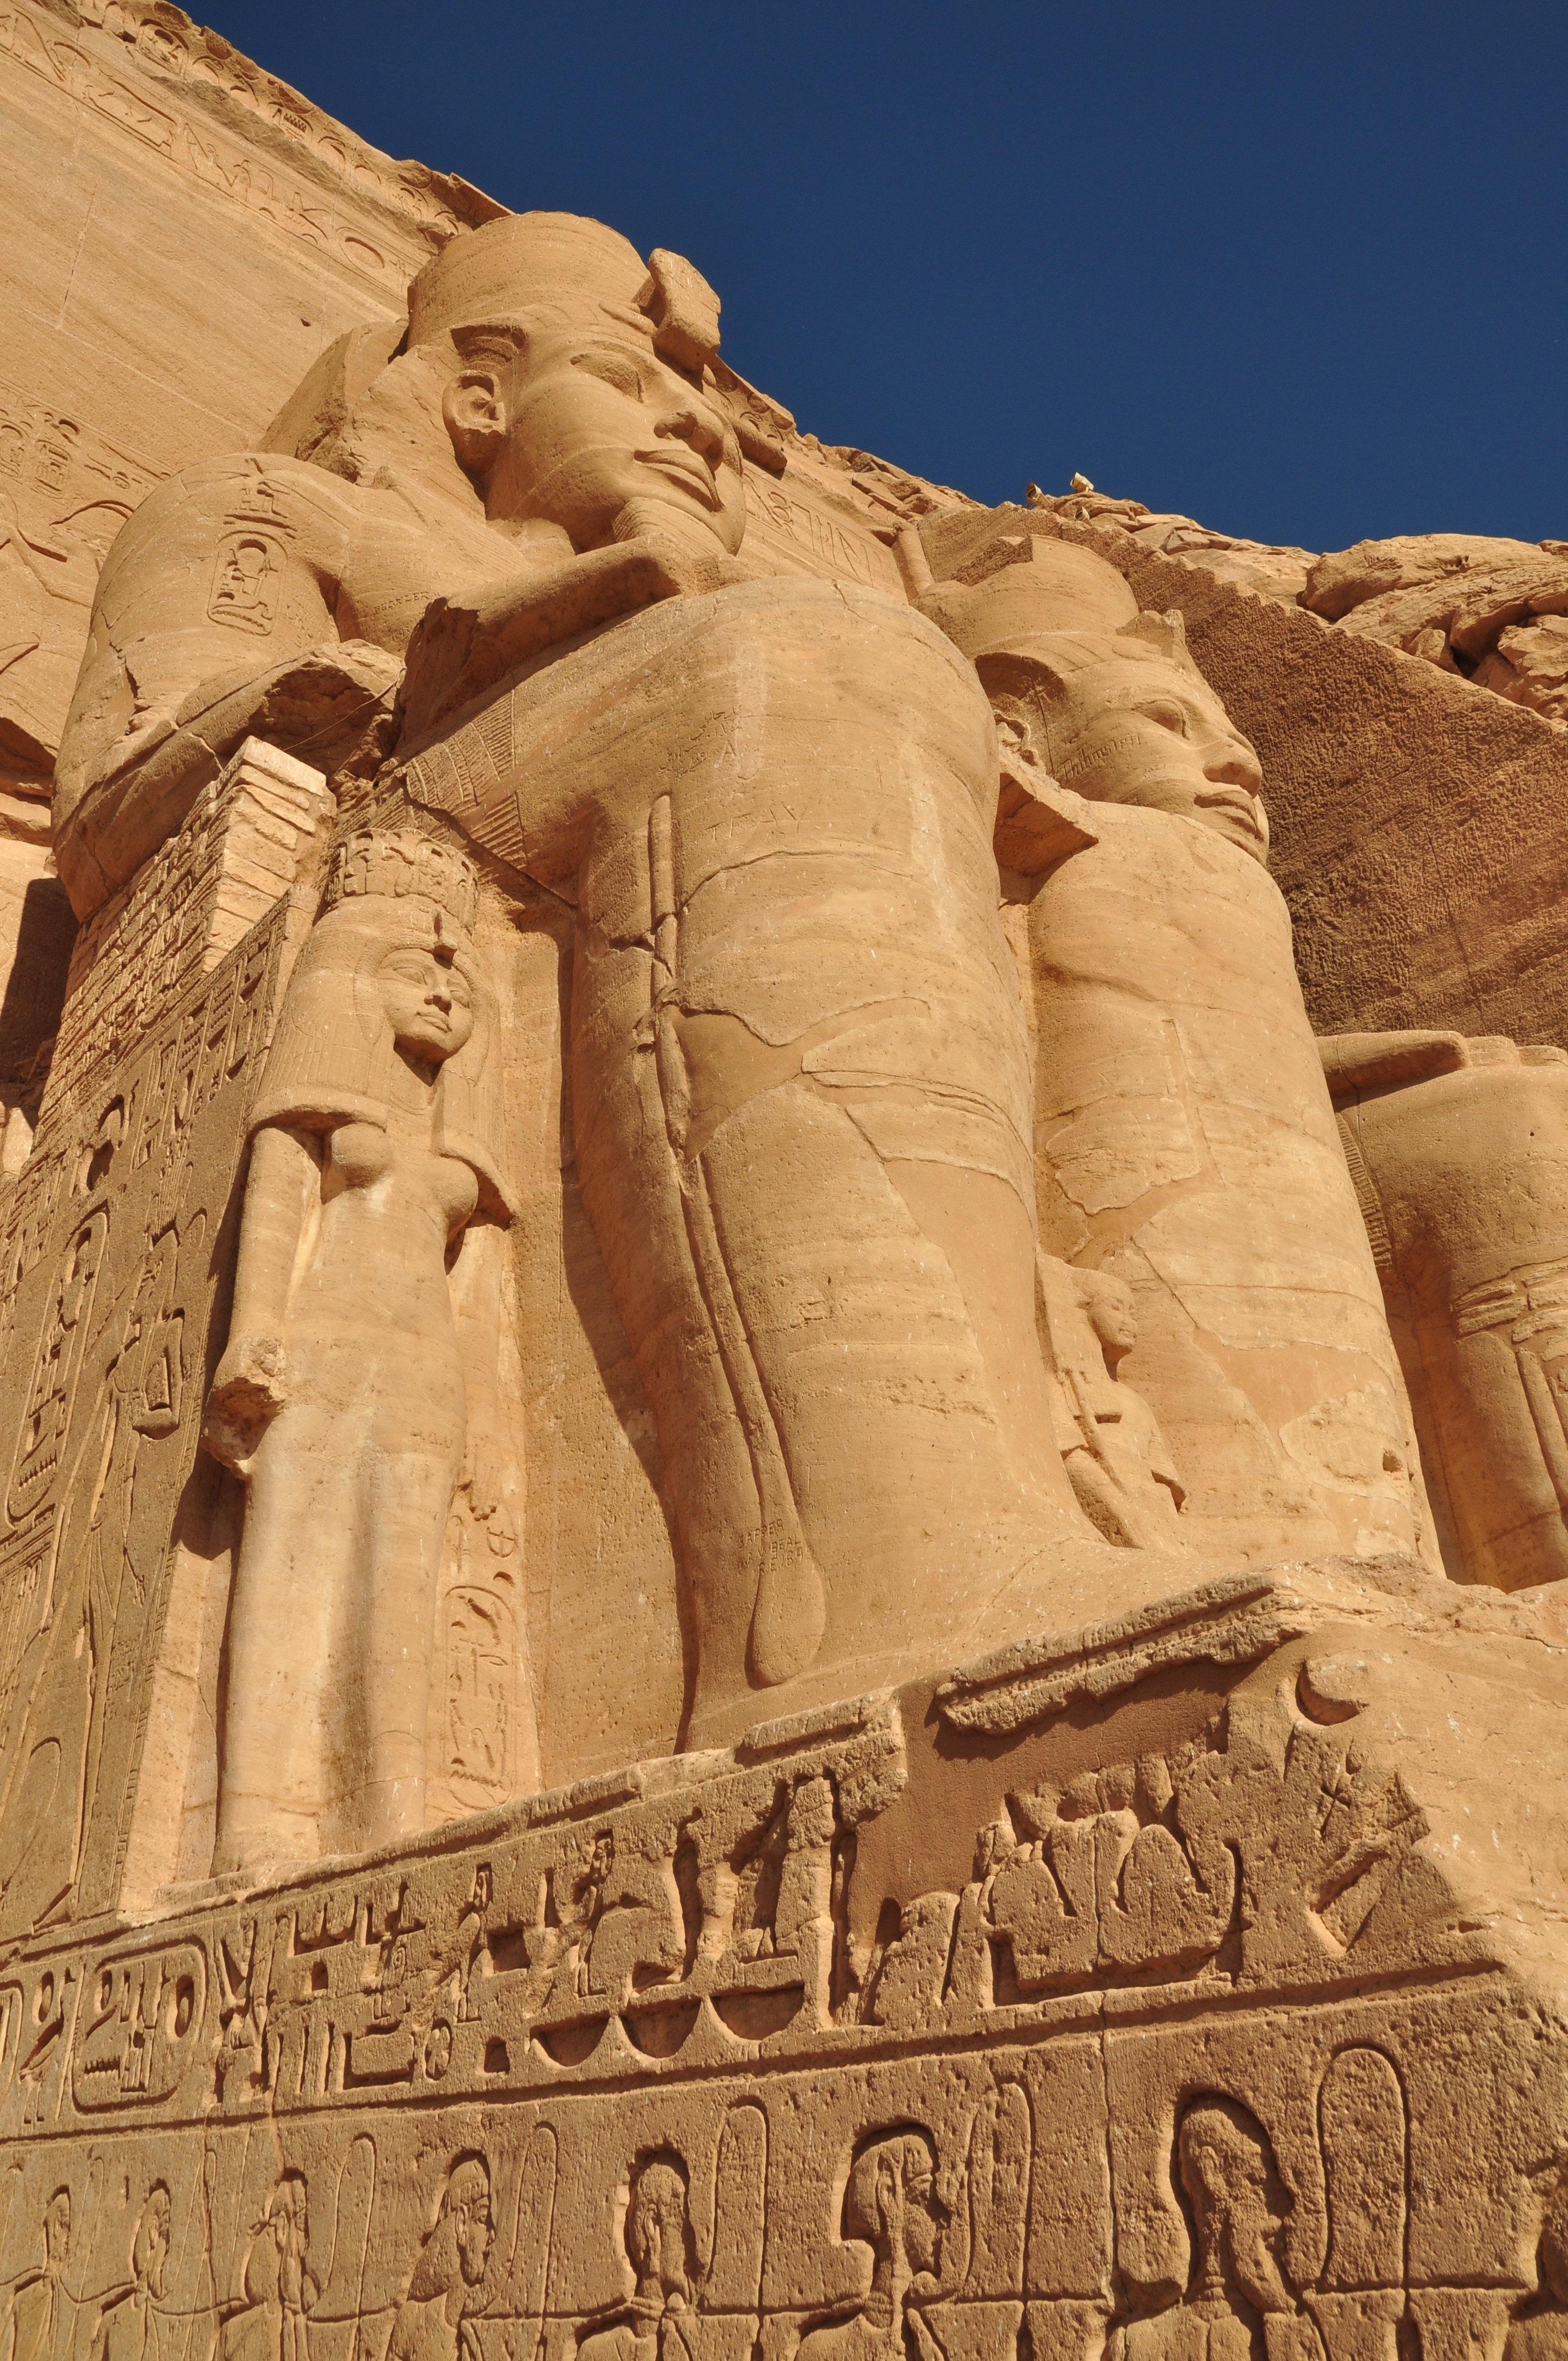 D3 阿斯旺康翁波埃德夫 这一天,我们乘坐邮轮从埃及最美丽的城市阿斯旺出发,开始了由南向北的埃及之旅。 埃及属四大文明古国之一,历史悠久。埃及国土中百分之97是沙漠,尼罗河纵贯整个国家。公元前一万多年,在这沙漠之国诞生了人类最早的灿烂古文明。以前对埃及的印象仅是金字塔古迹,为此,来埃及旅游前,我看了些有关的书籍,在游览古迹时还是很有帮助。否则,即便古迹神庙现场有导游讲解,也会被众多的朝代、法老、神话和众多的神,搞得云里雾里。 图书、实地游览以及导游的现场讲解,丰富了有关的埃及知识。有如下几点是本人的收获